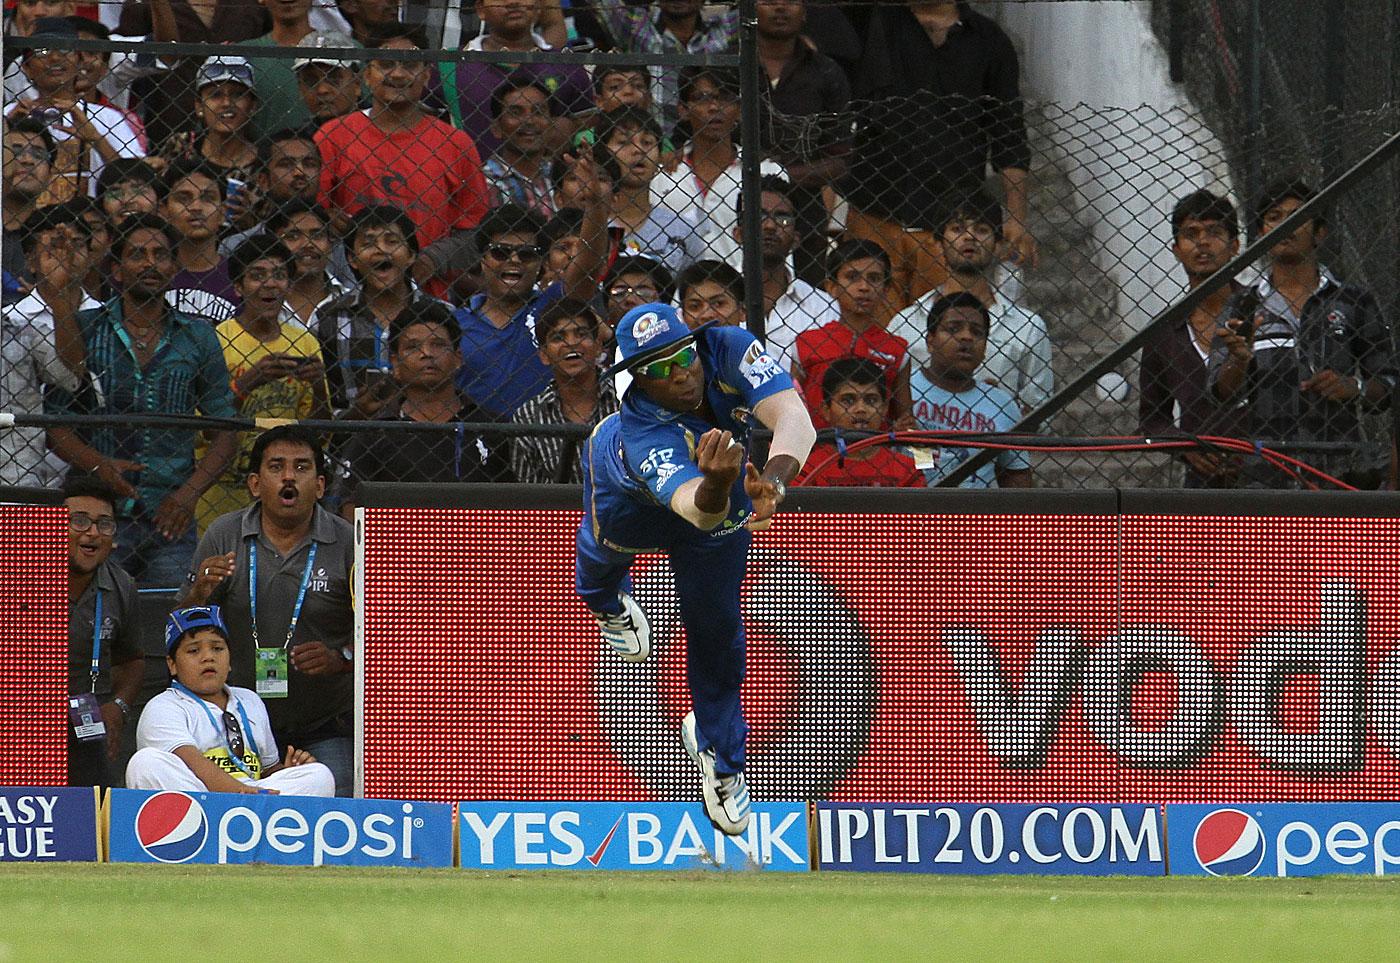 No arguments: T20 has definitely raised fielding standards